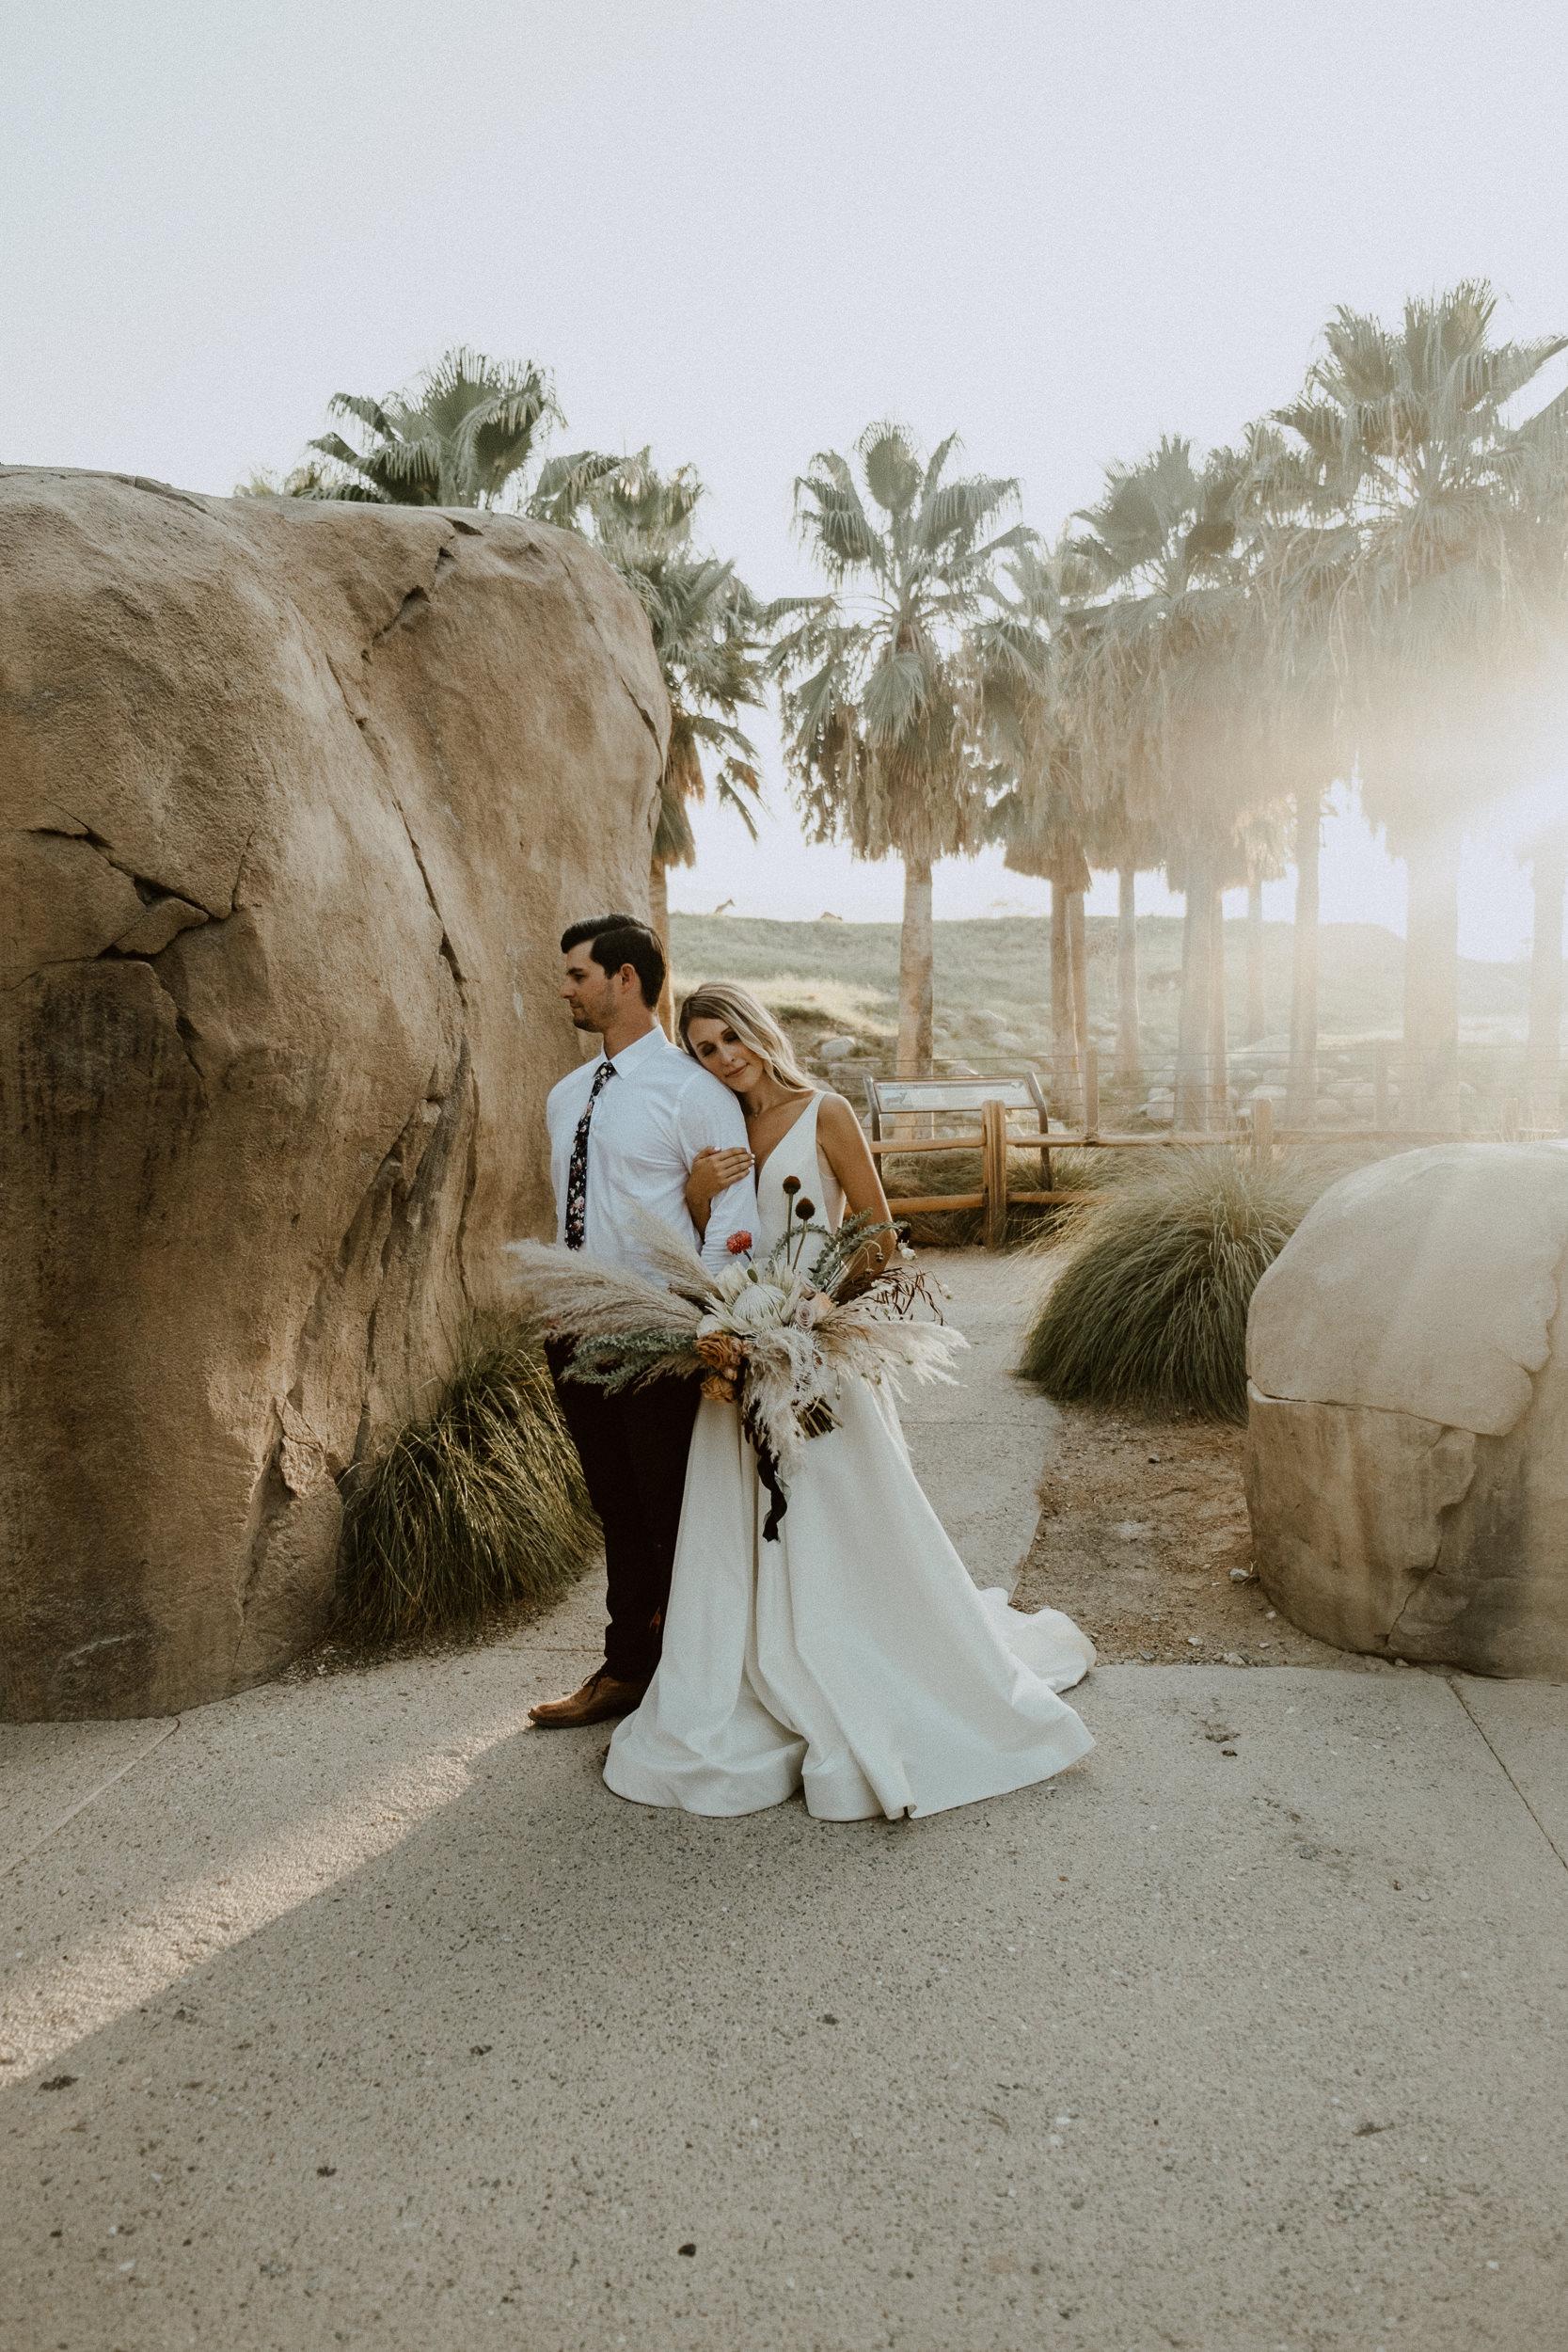 sChelsie + Chris - The Desert Shootout Wedding Romantics at The Living Desert-28.jpg